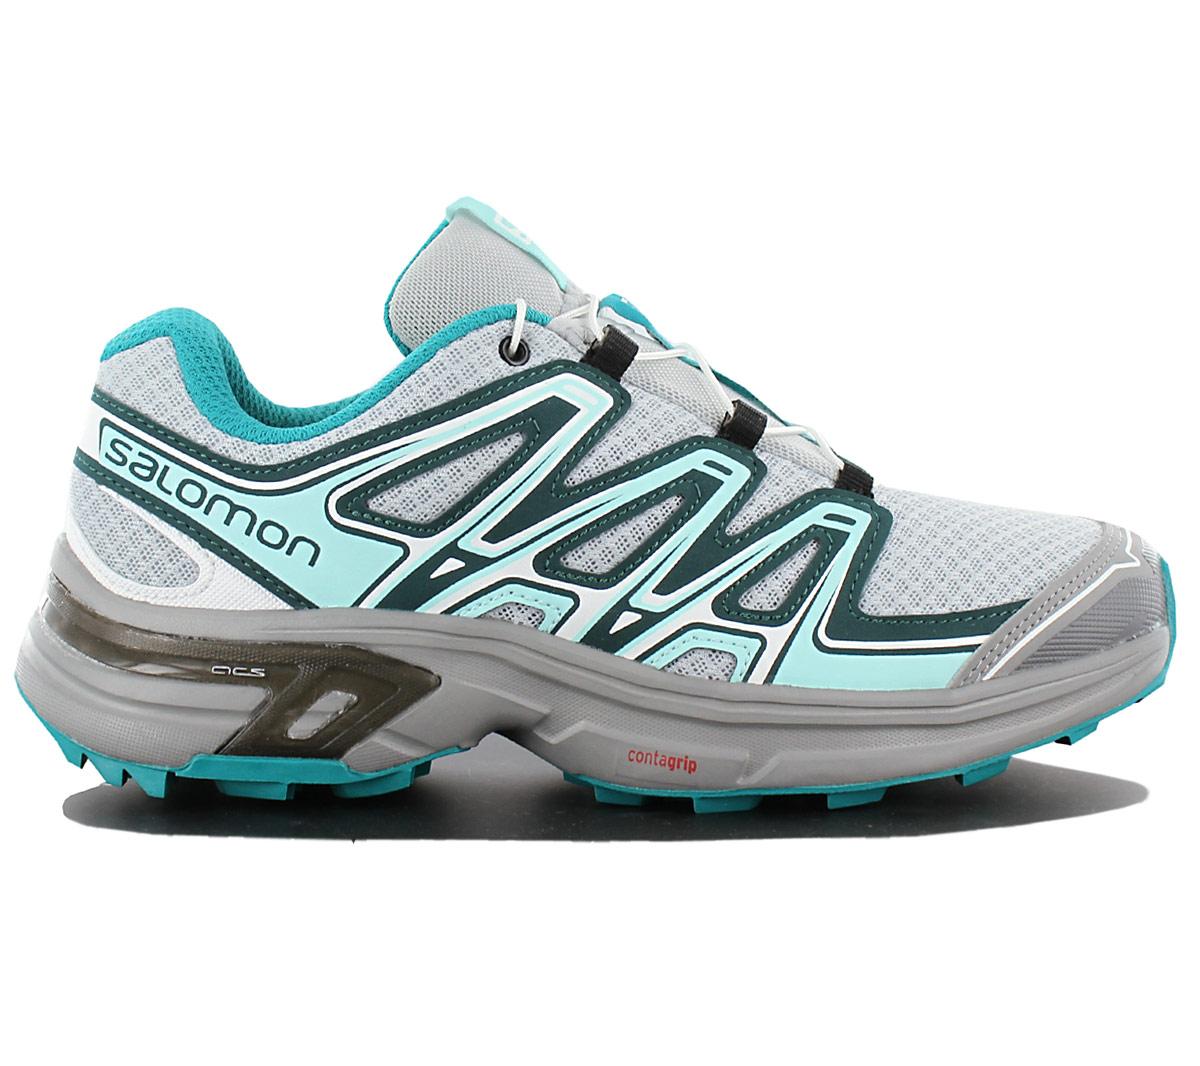 993ec293738f Salomon Wings Flyte 2 W Ladies Shoes Hiking Shoes Trail Running ...